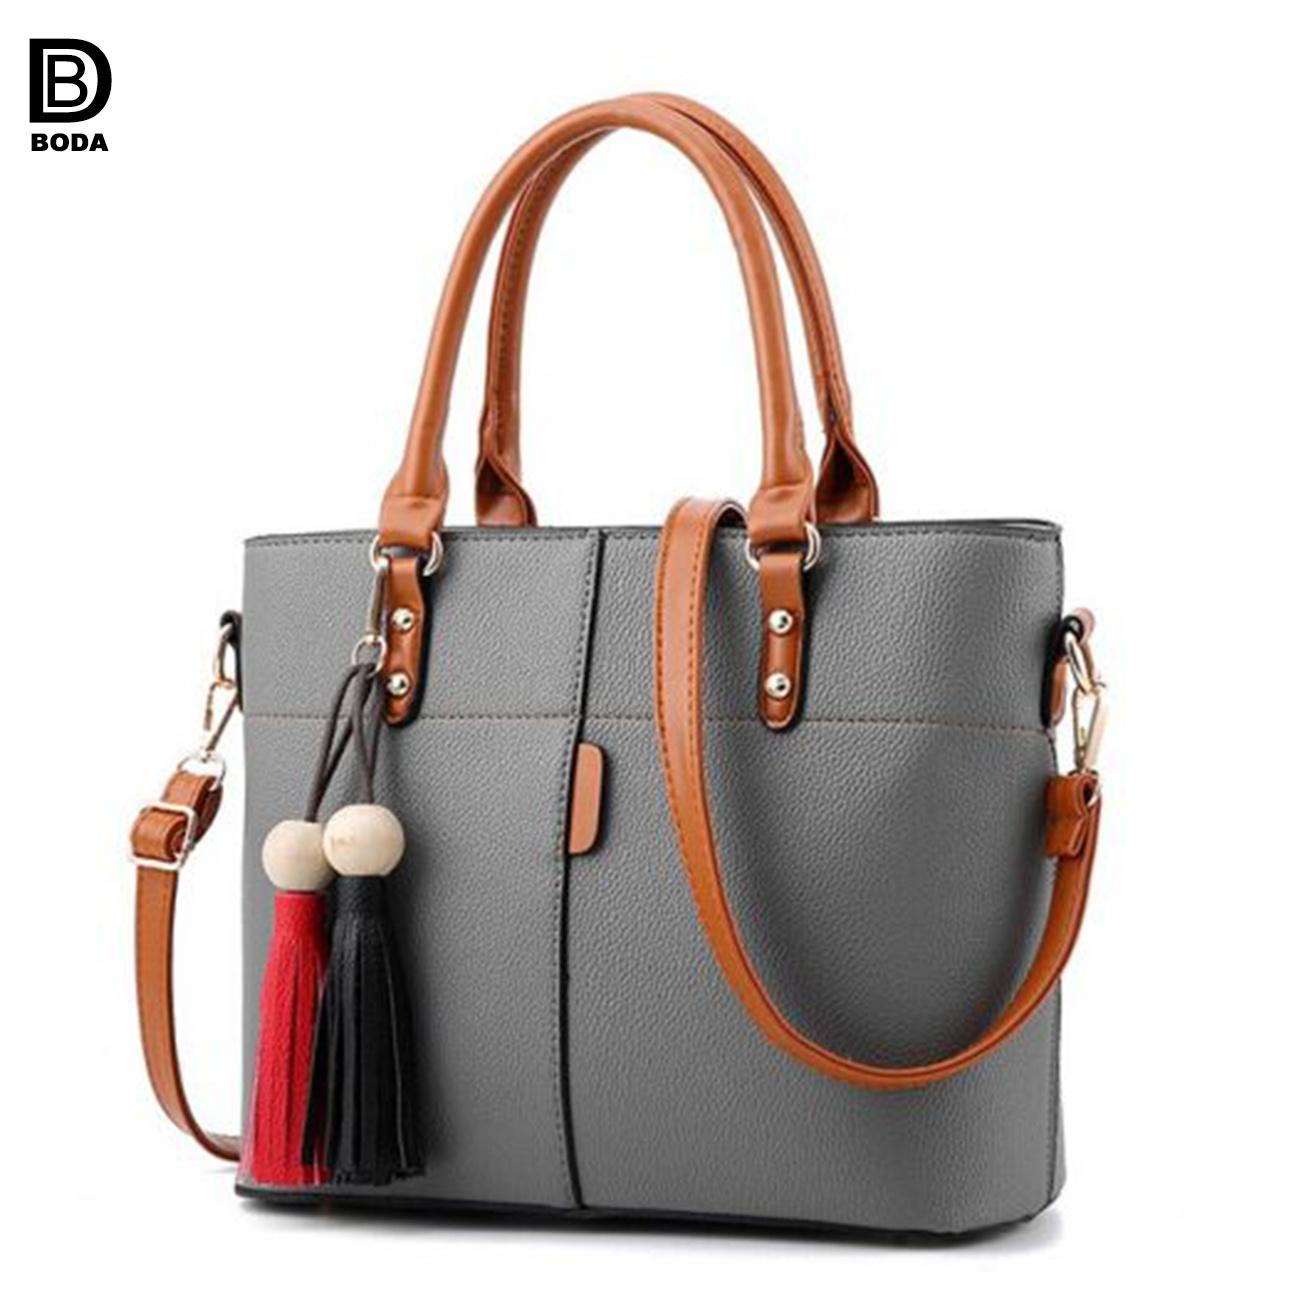 7c93b4c768c [Hot Item] New Design Popular European PU Handbag for Ladies′ Weekend  Shopping